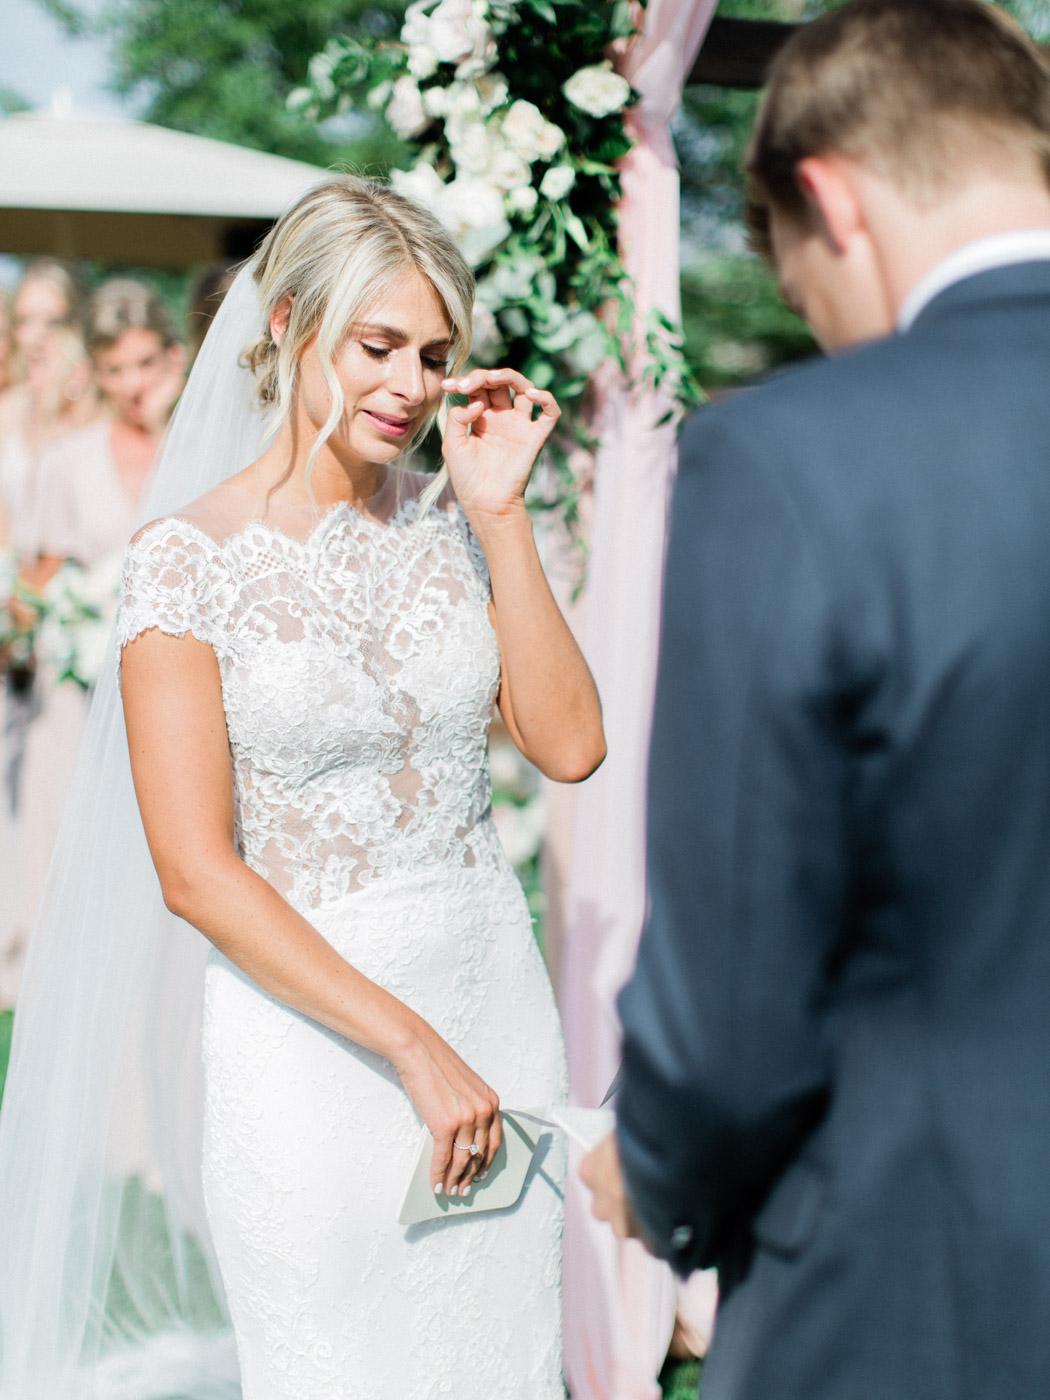 Toronto-Muskoka-wedding-photographer-summery-fun-documentary-the-marriott-rosseau86.jpg